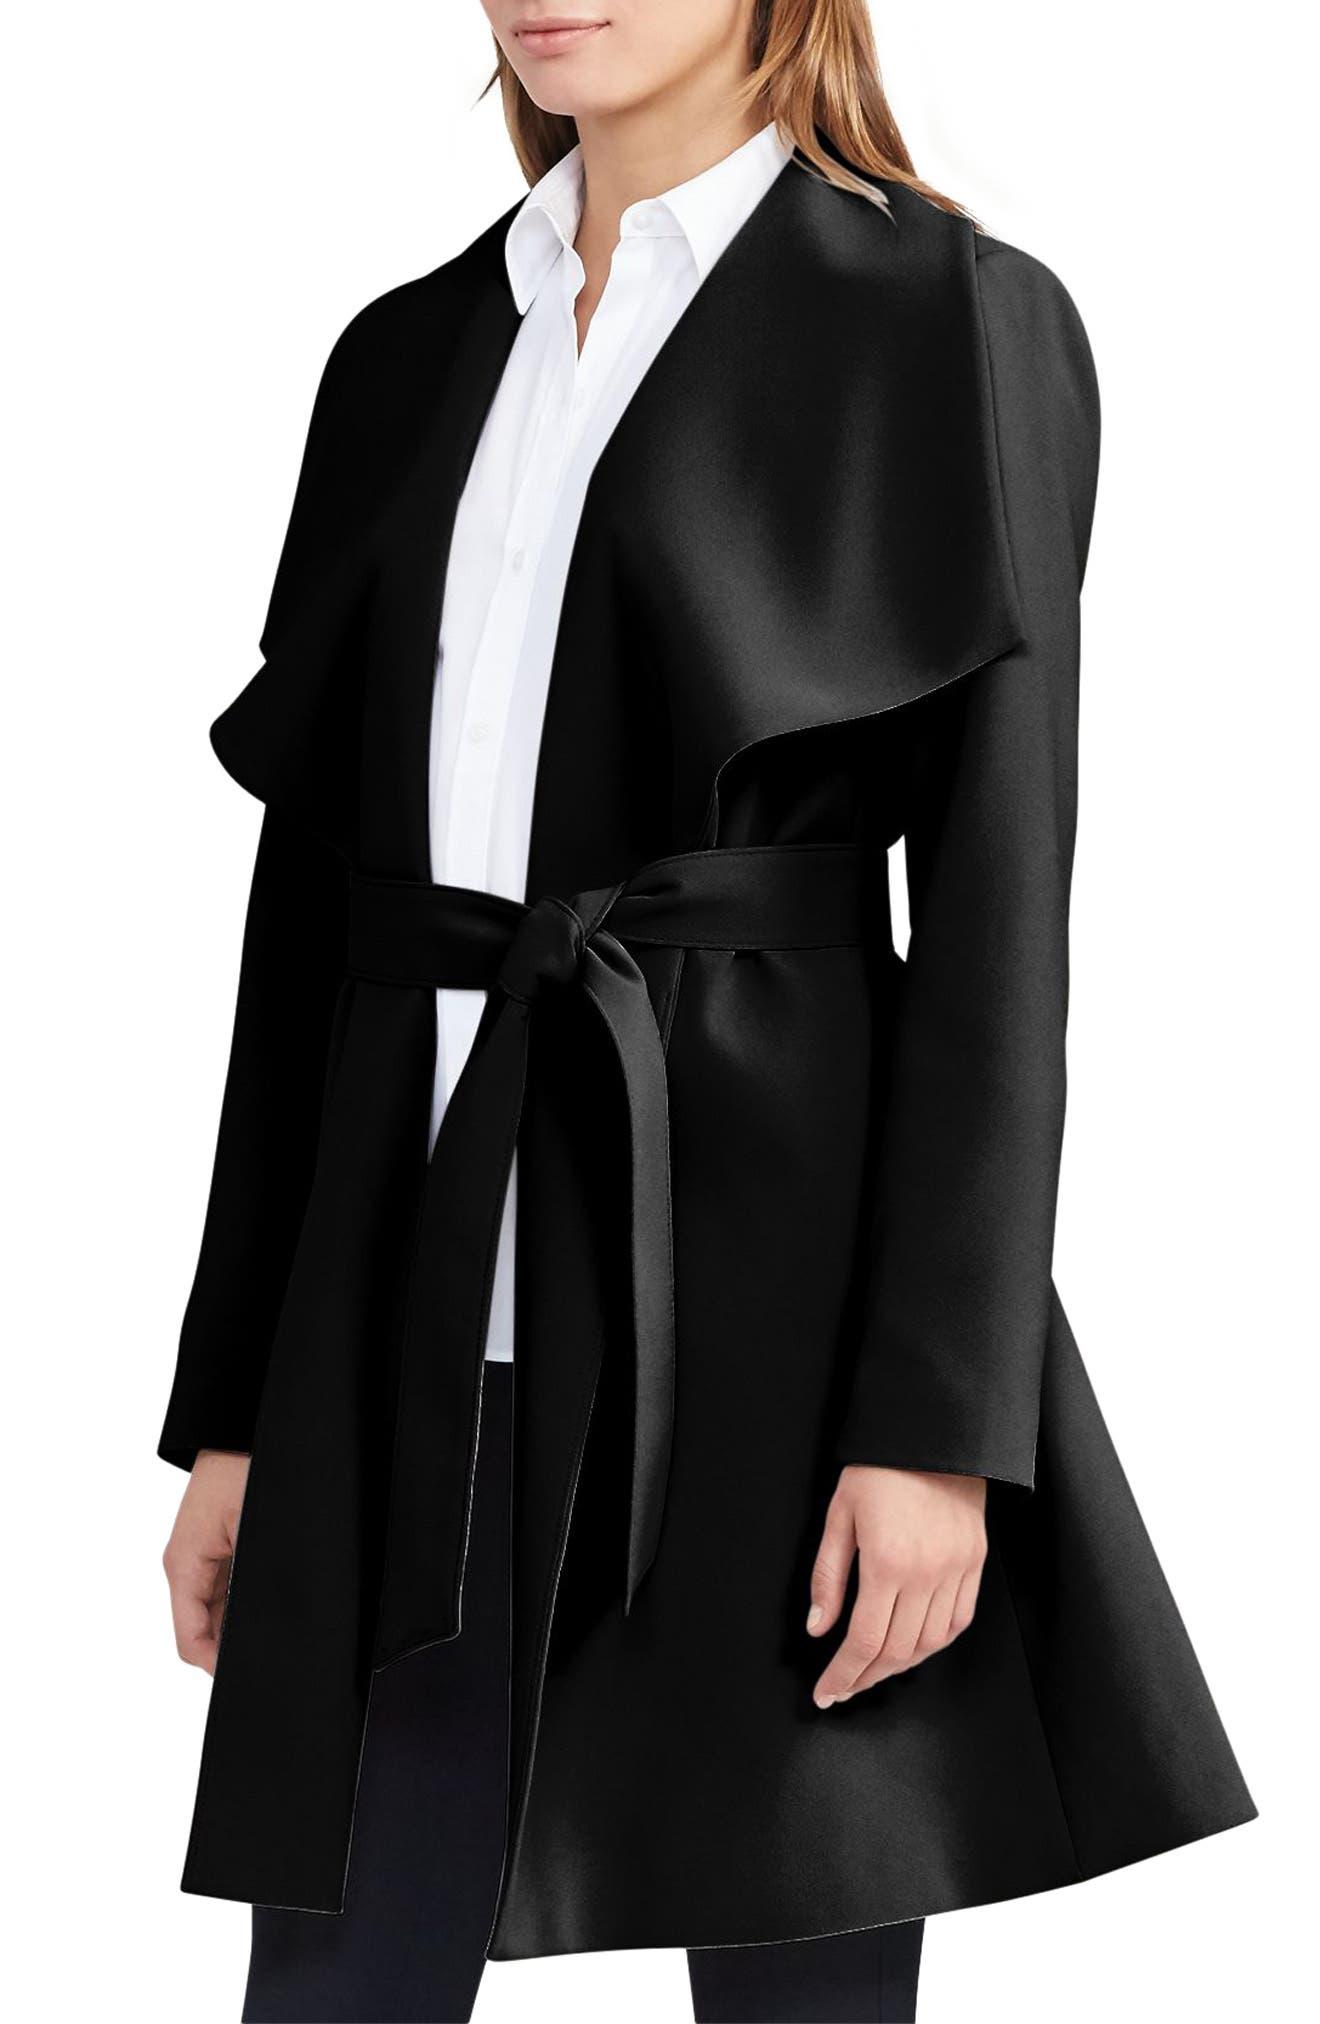 LAUREN RALPH LAUREN, Belted Drape Front Coat, Main thumbnail 1, color, 002